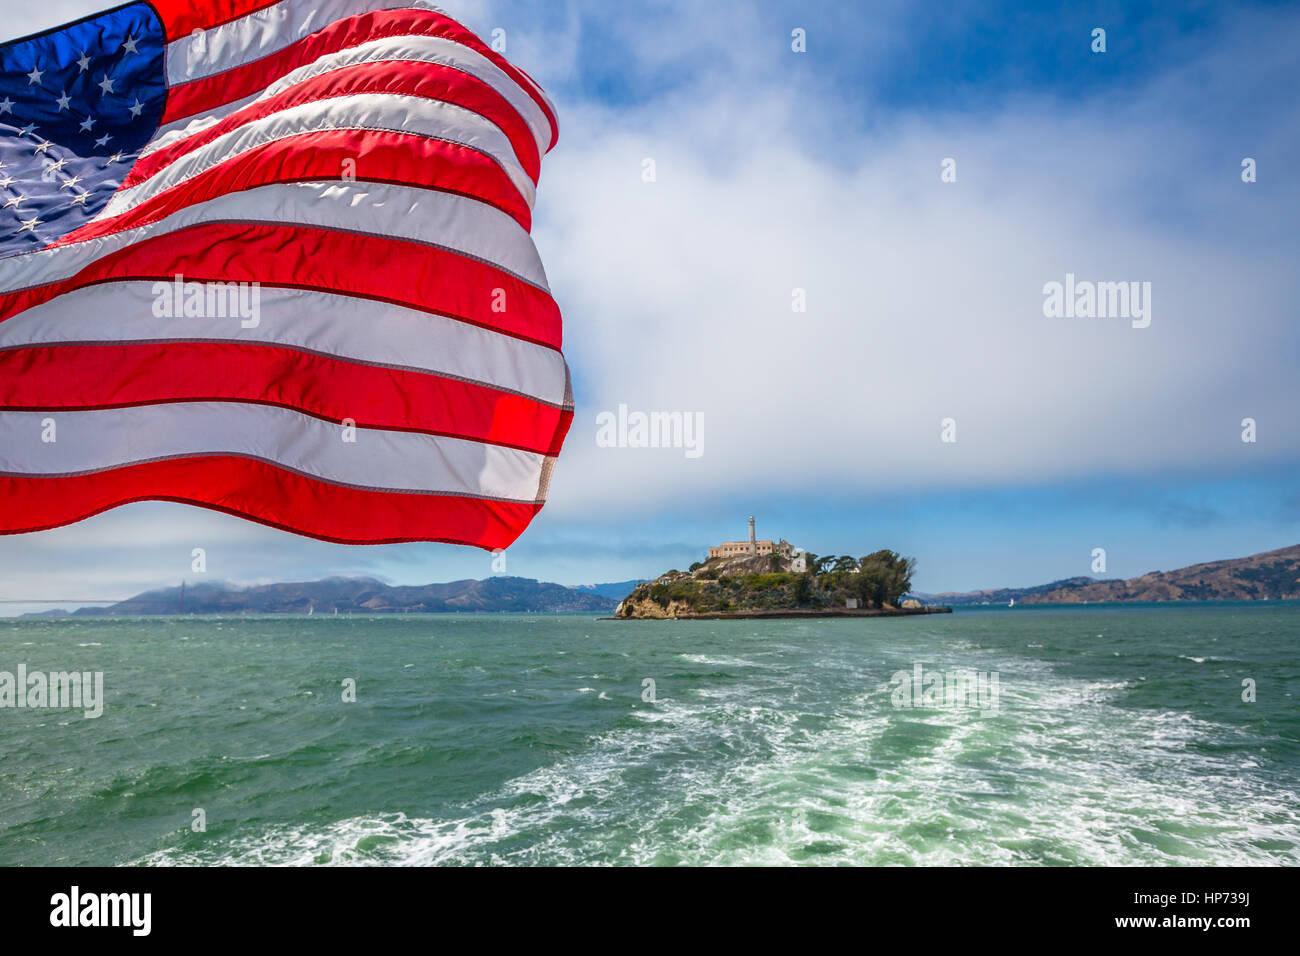 Alcatraz island in San Francisco Bay skyline, California, United States. Sea view from boat to Alcatraz with American Stock Photo